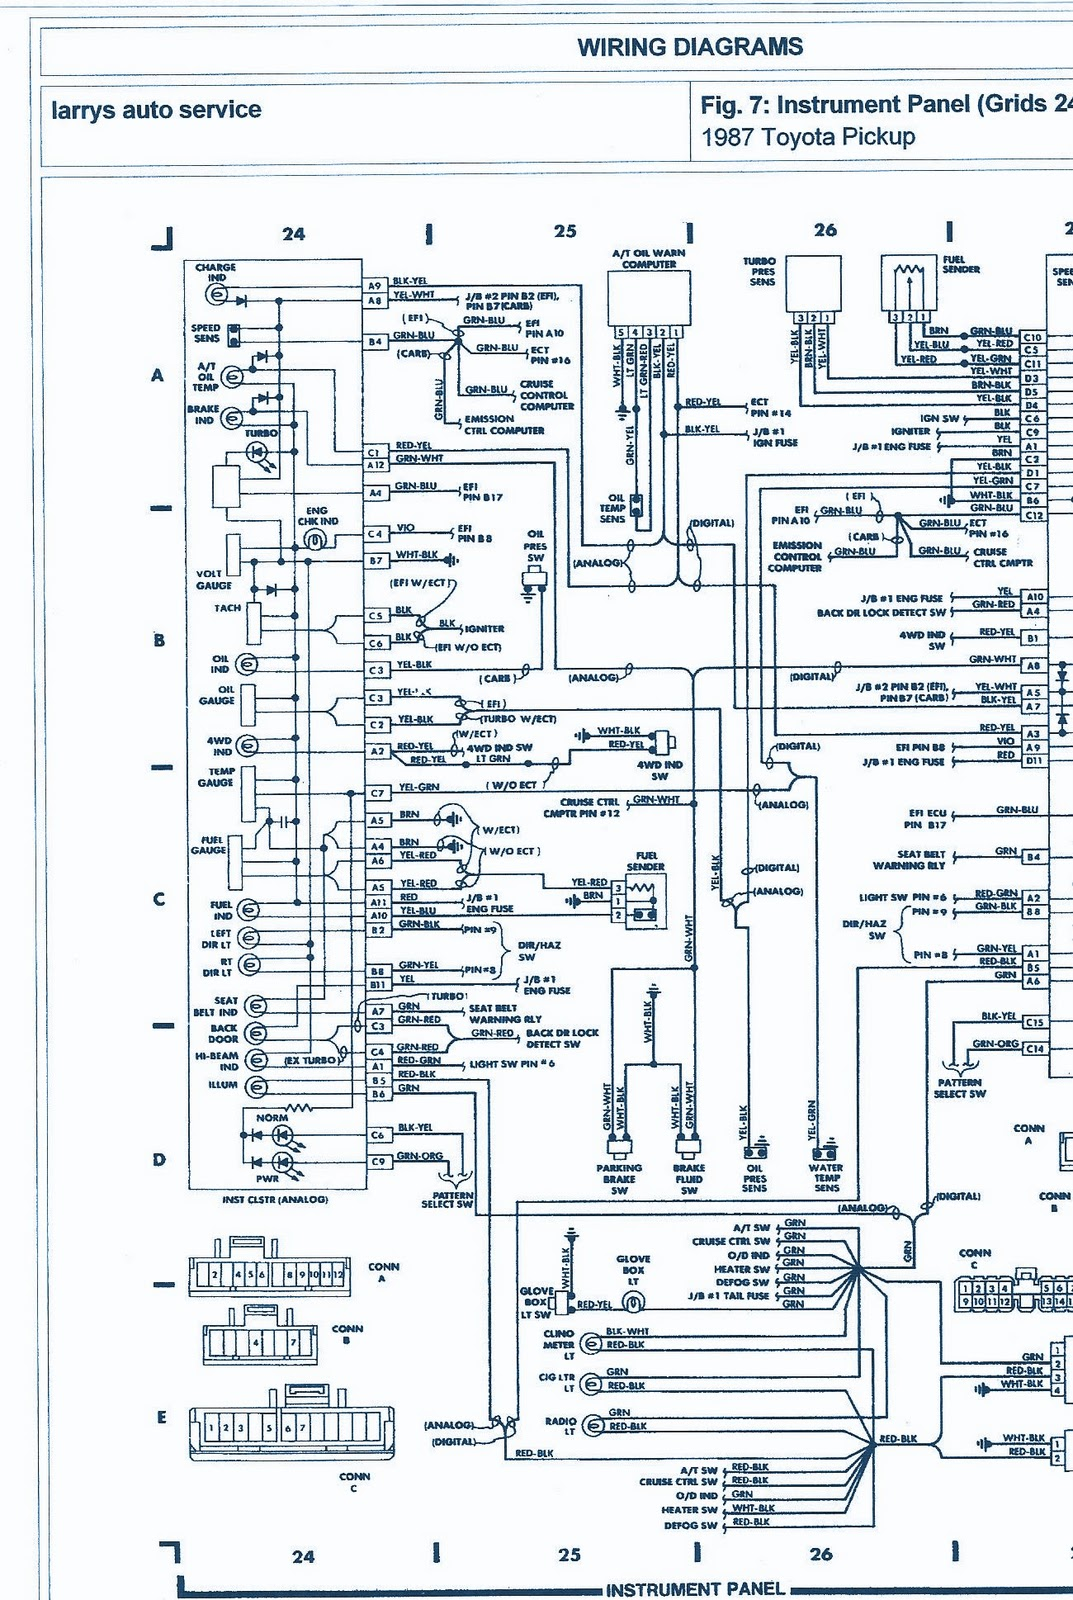 Cute 1990 Suburban Wiring Diagram Pictures Inspiration ...